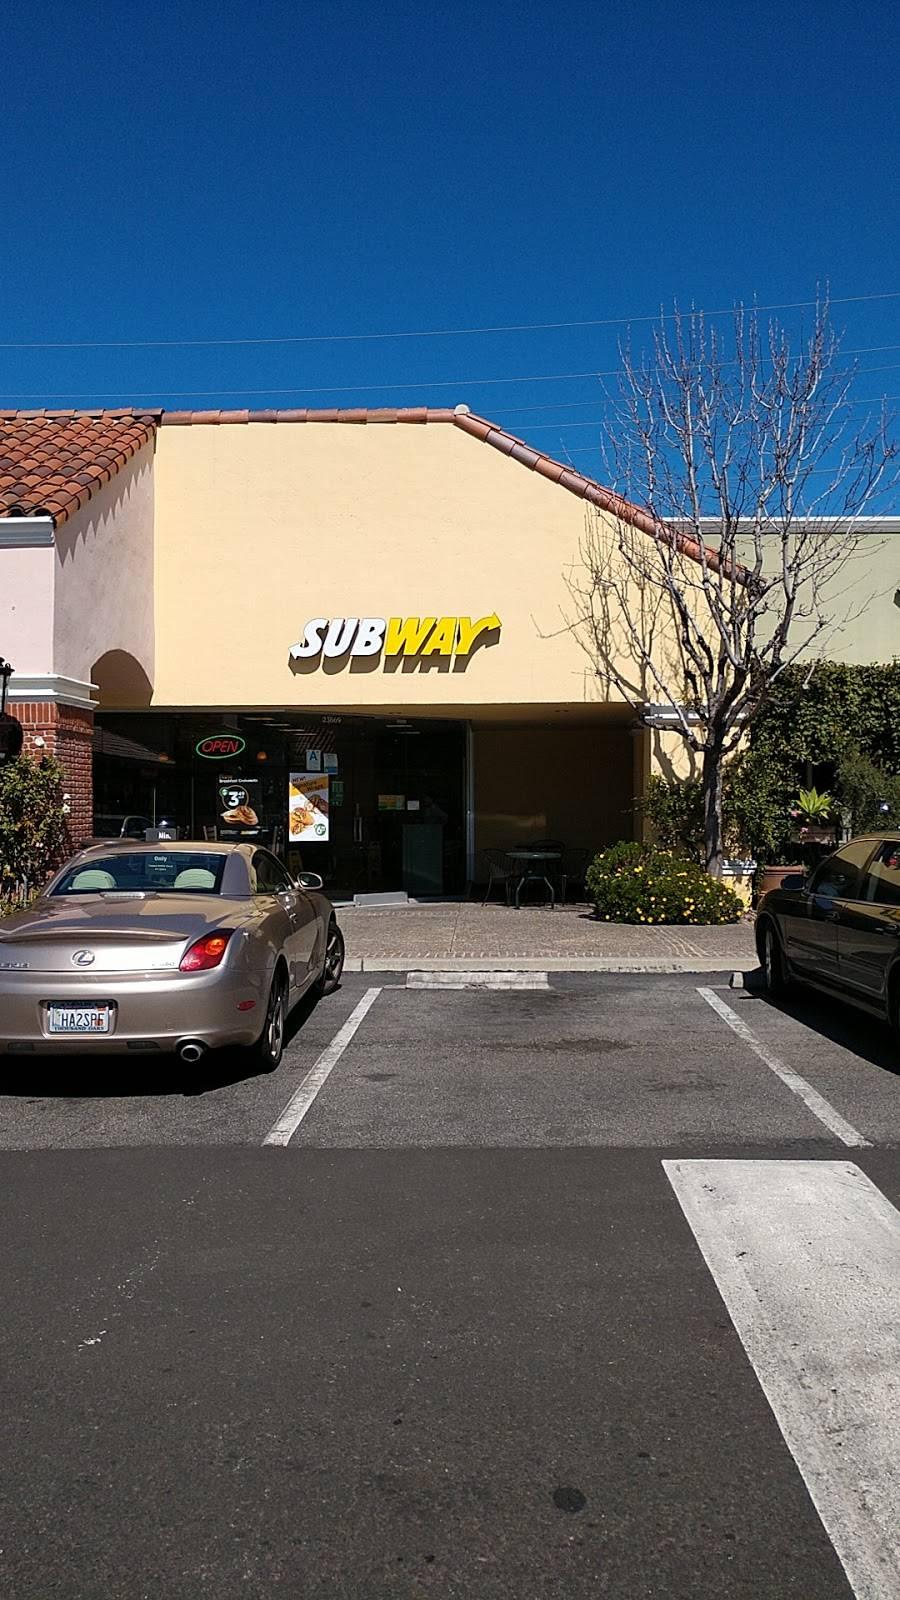 Subway Restaurants 23669 Calabasas Rd Calabasas Ca 91302